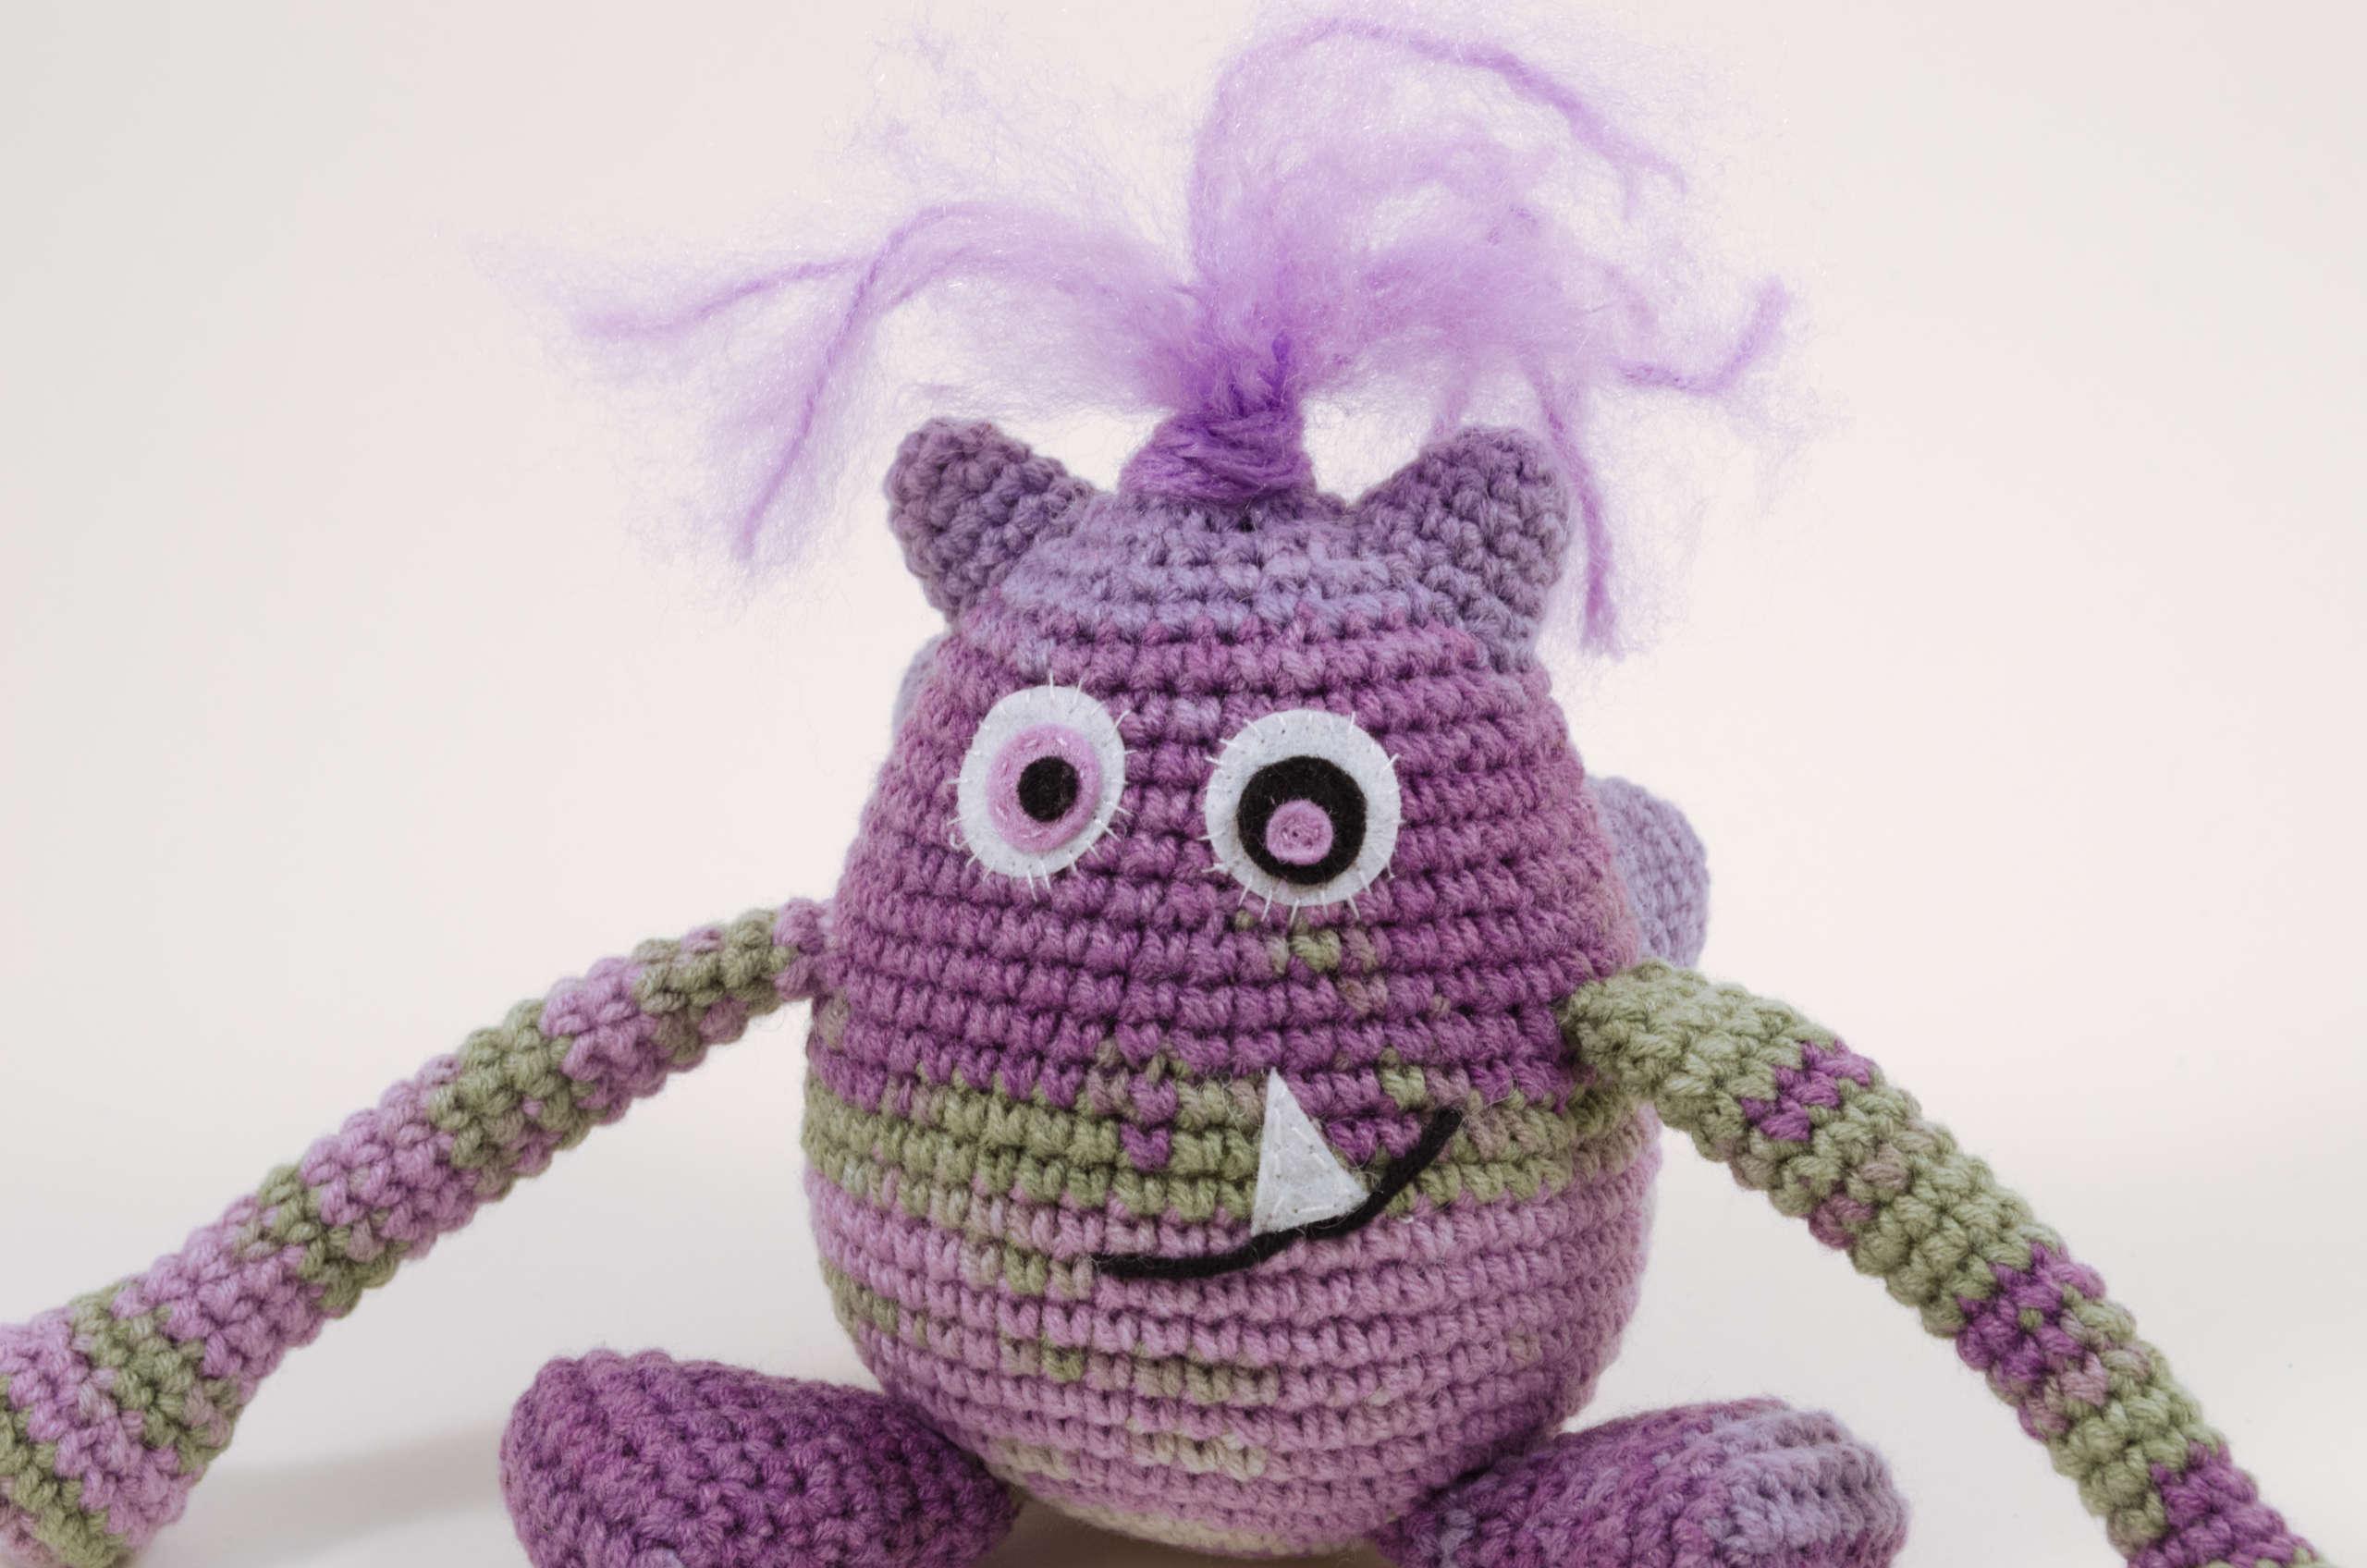 crochet purple monster close up view